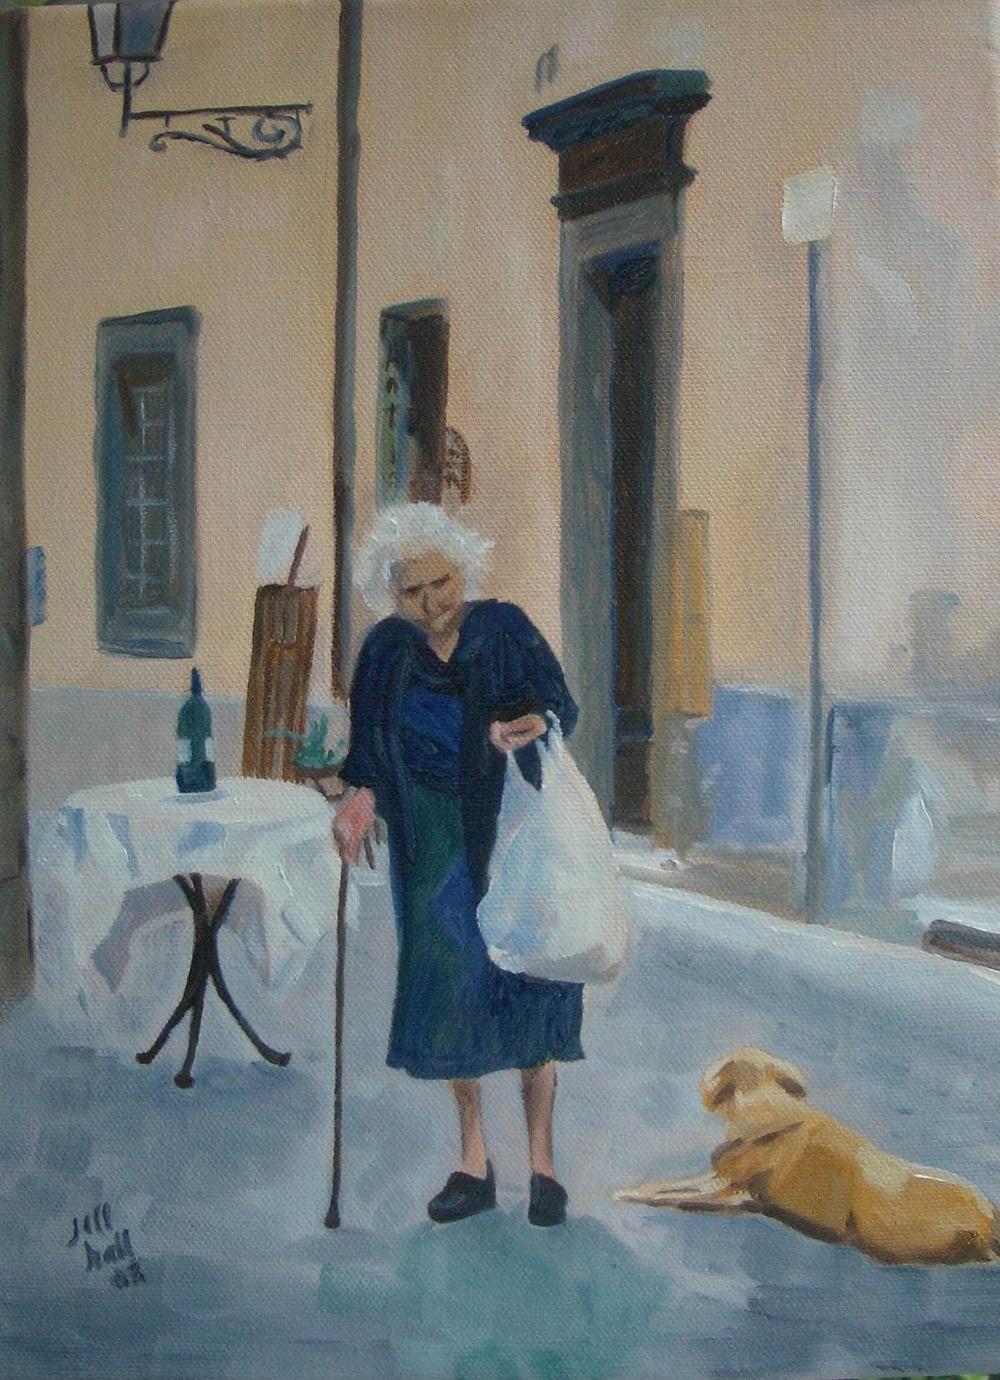 Italian Street Scene - 9x12